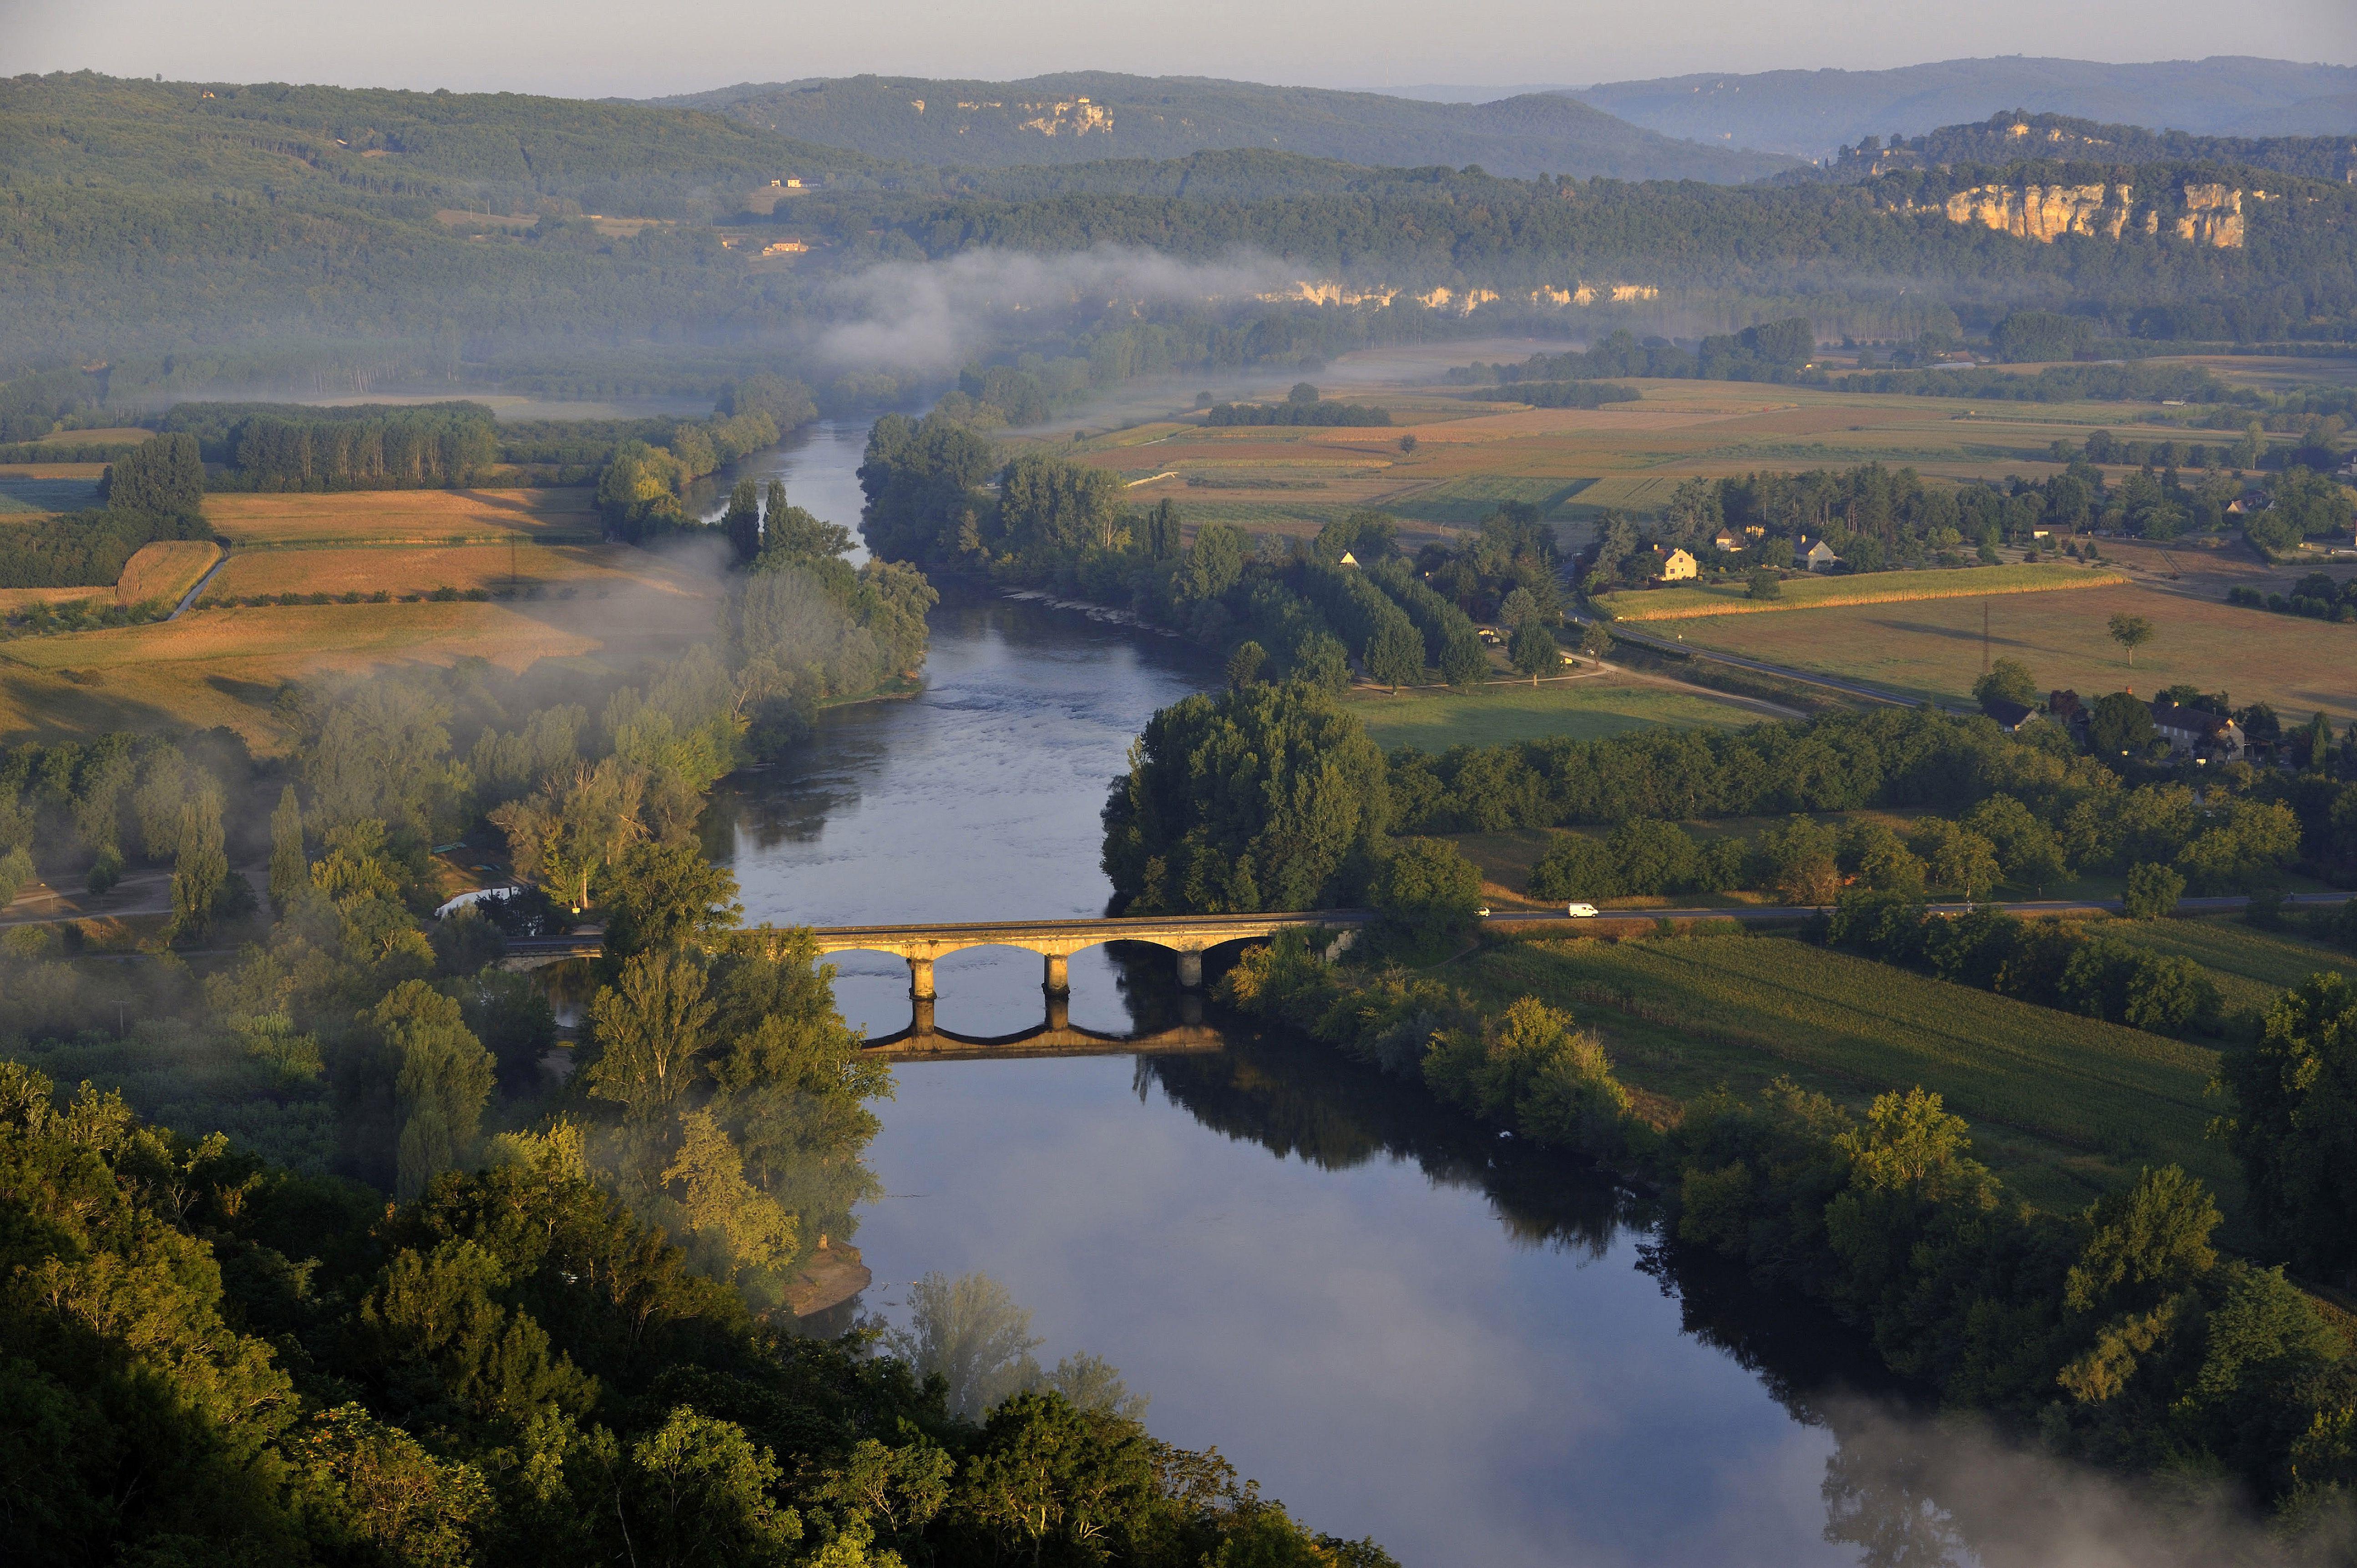 Nordfransk Flod